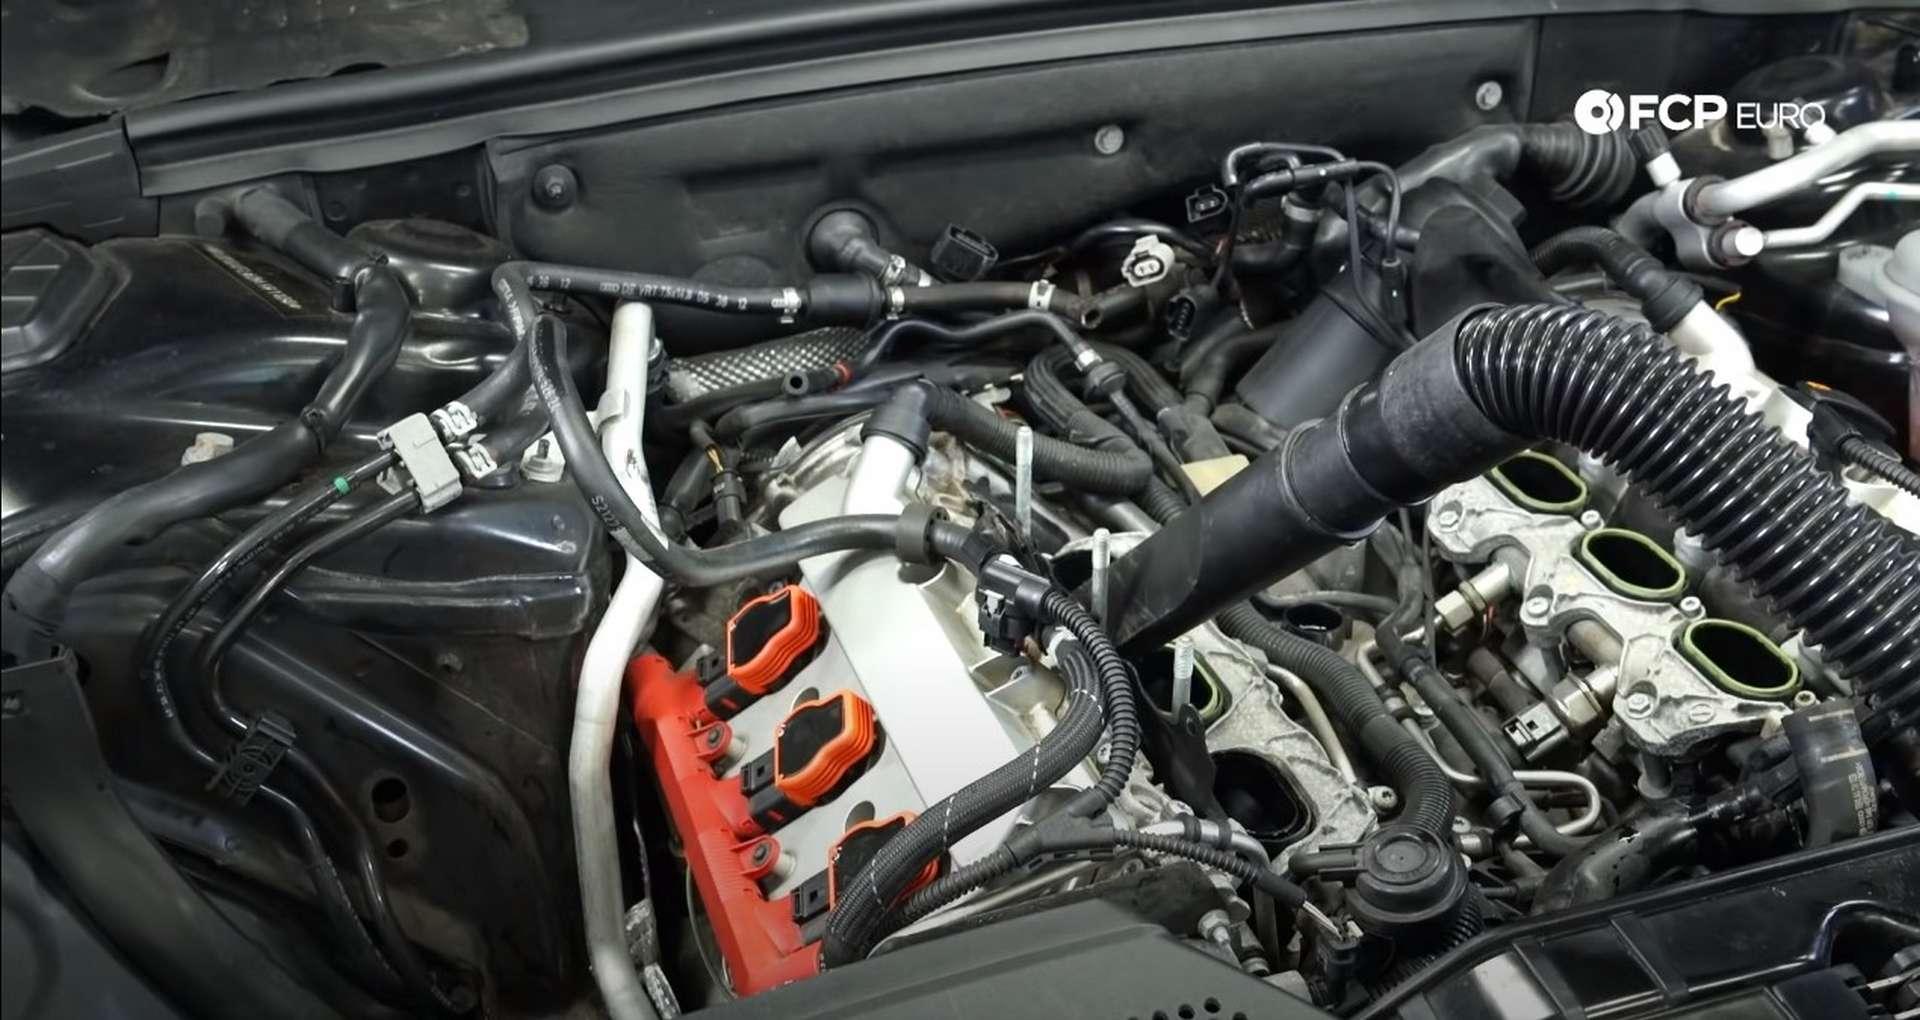 DIY Audi 3.0t Walnut Blasting Intake Valves removing the supercharger